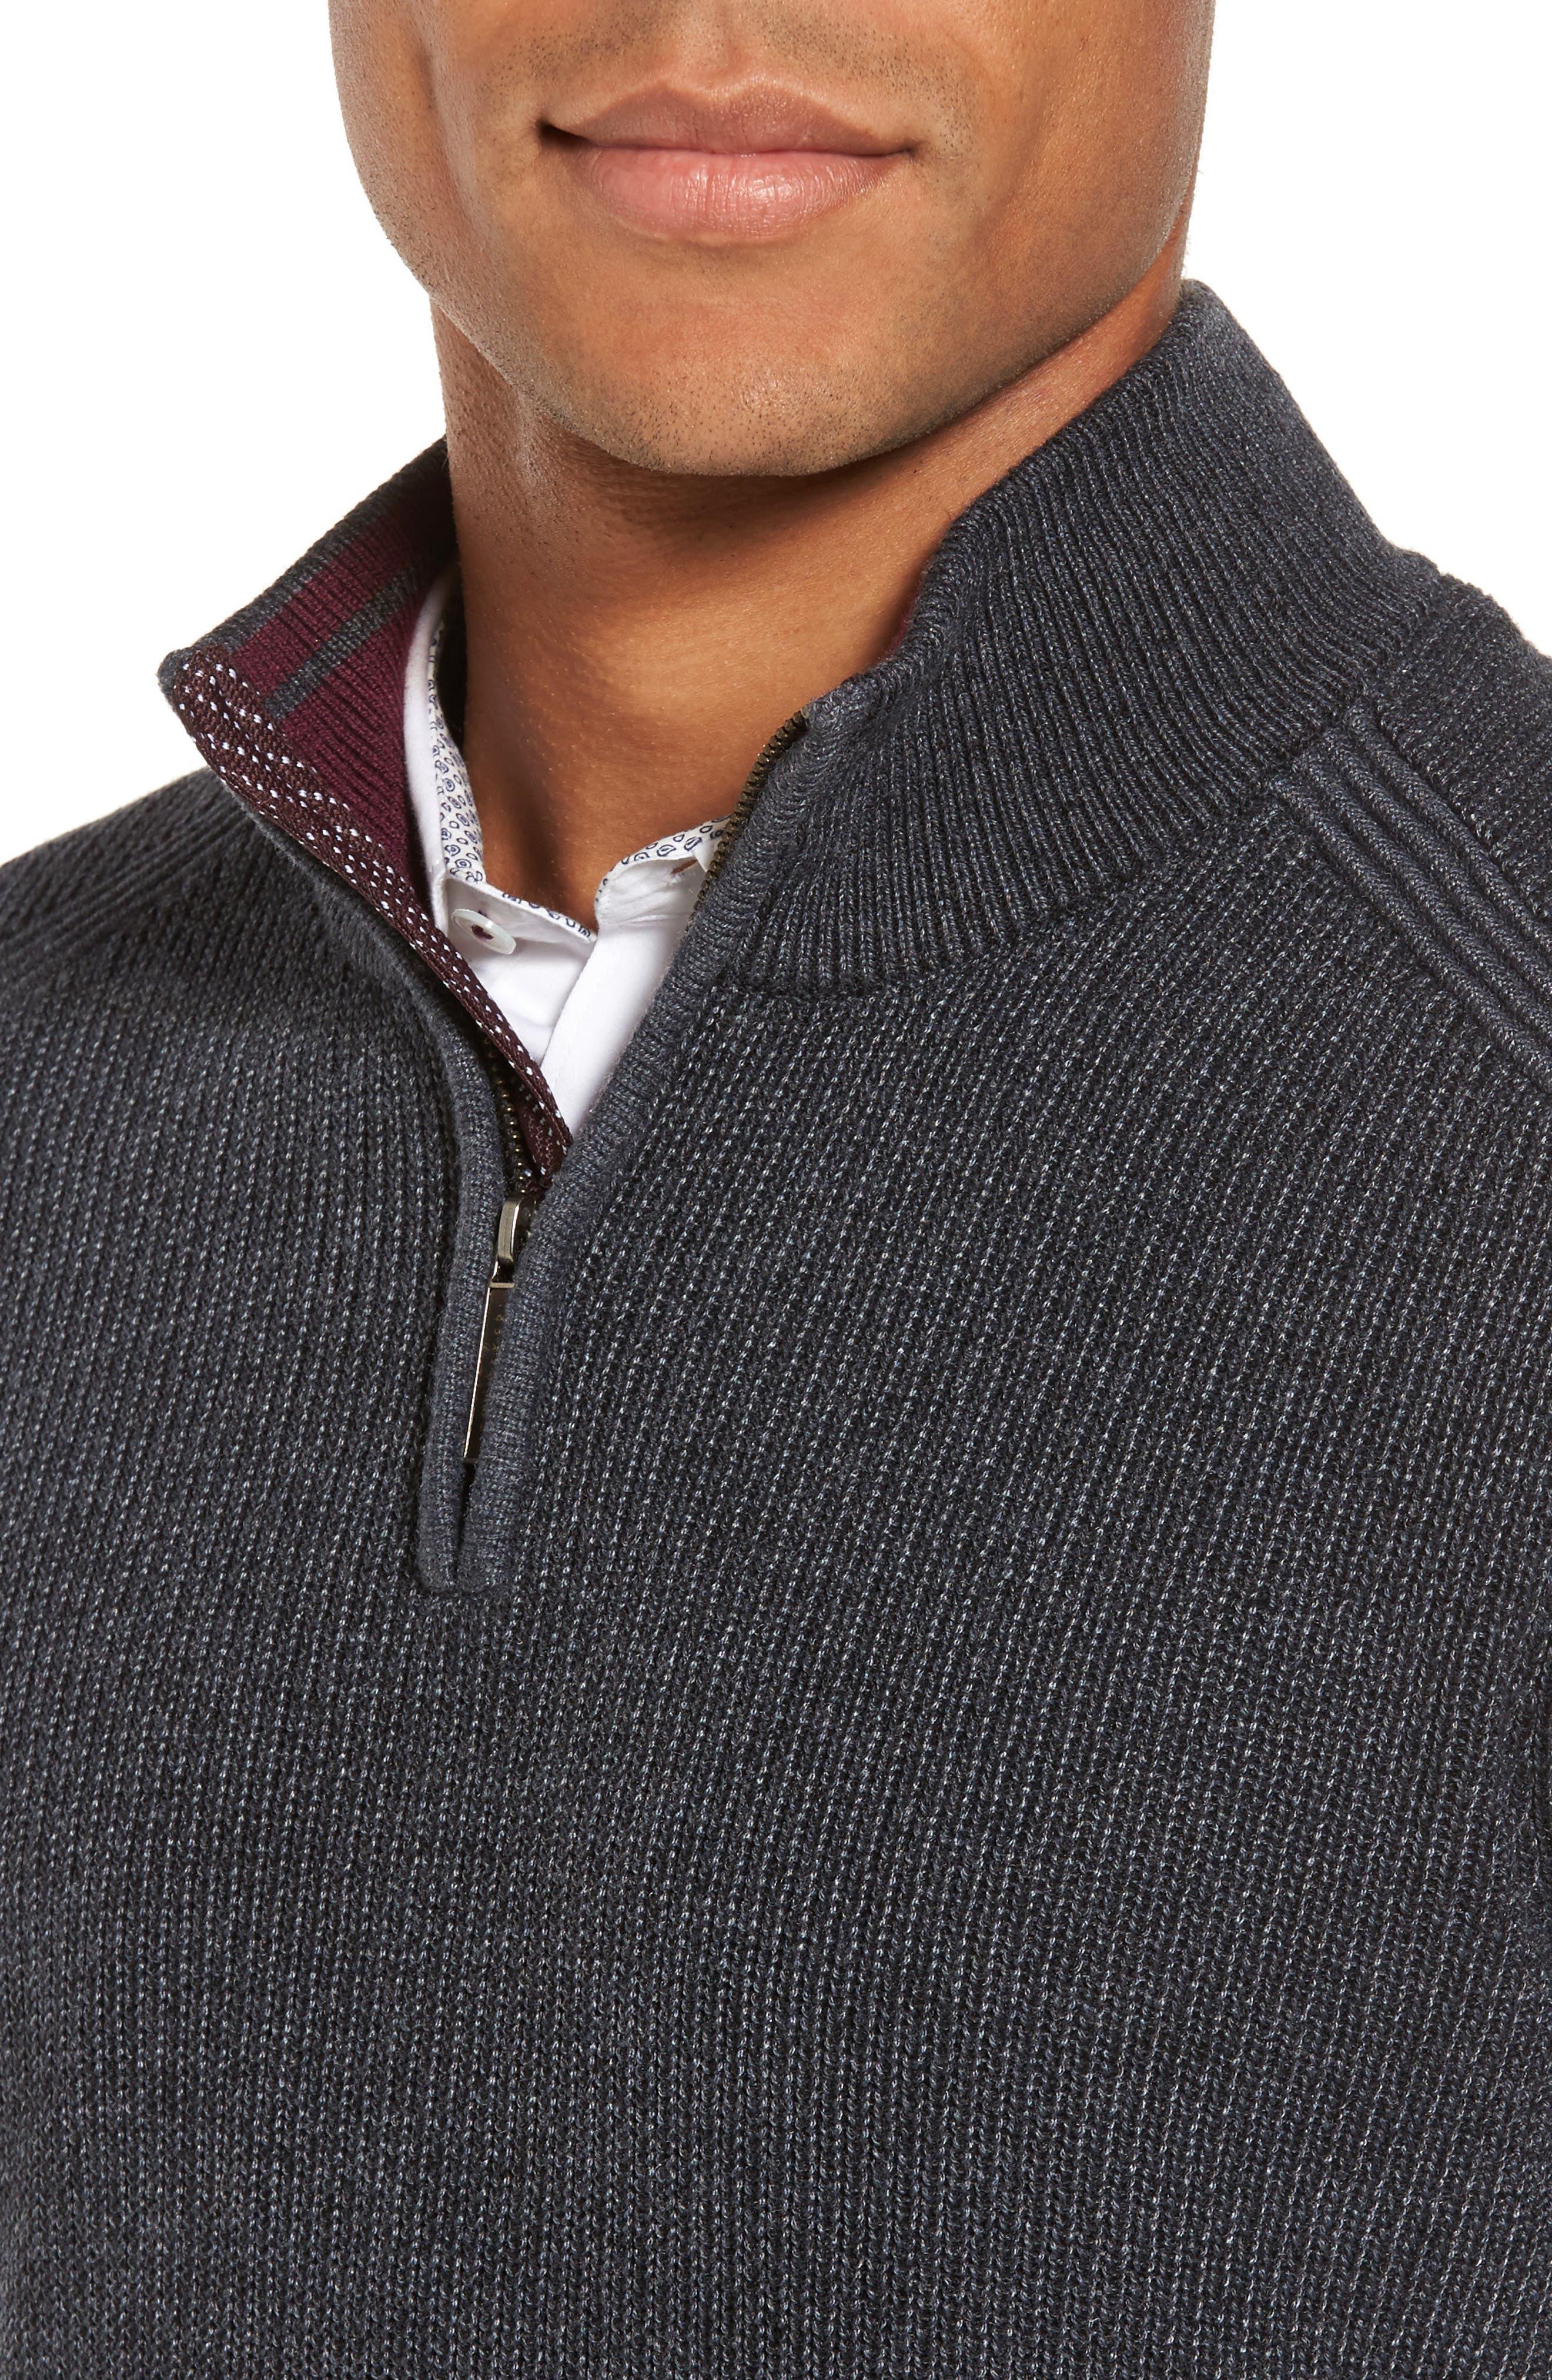 Alternate Image 4  - Ted Baker London Slim Fit Quarter Zip Sweater (Tall)